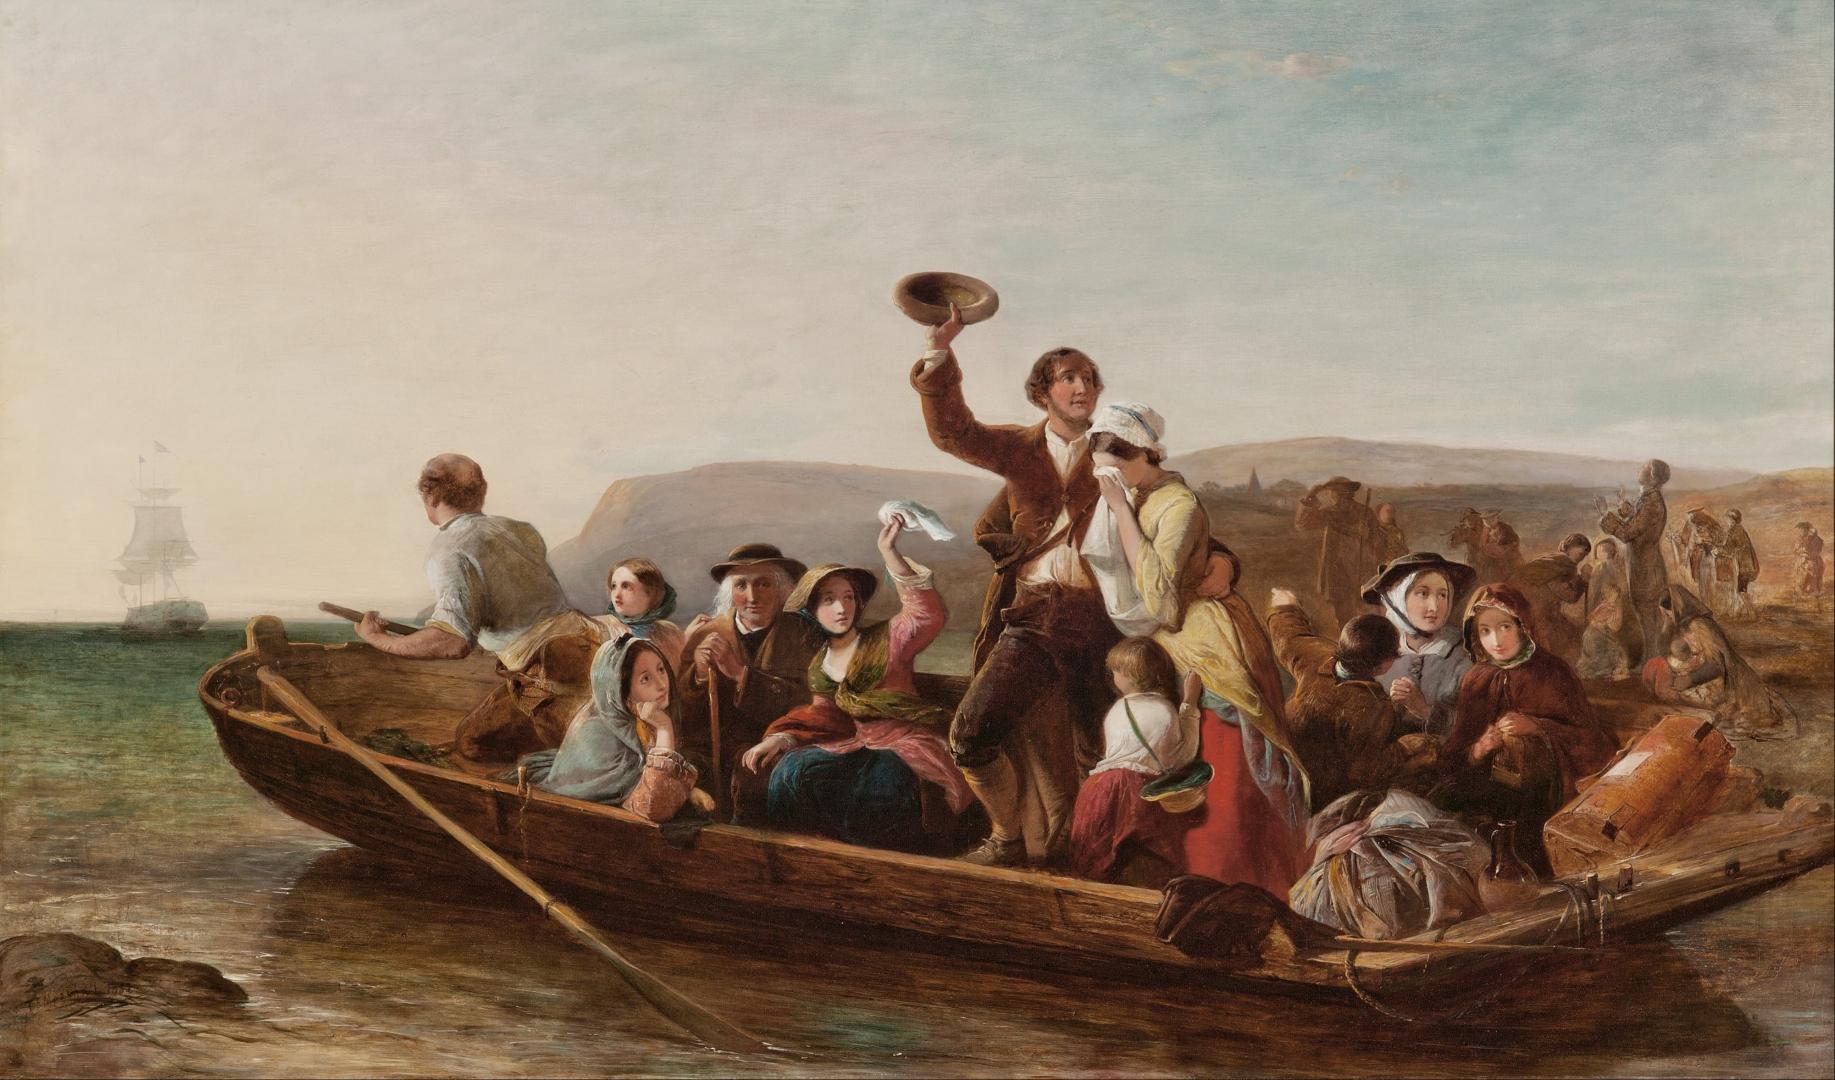 Томас Фалкон Маршалл. Эмиграция. 1852